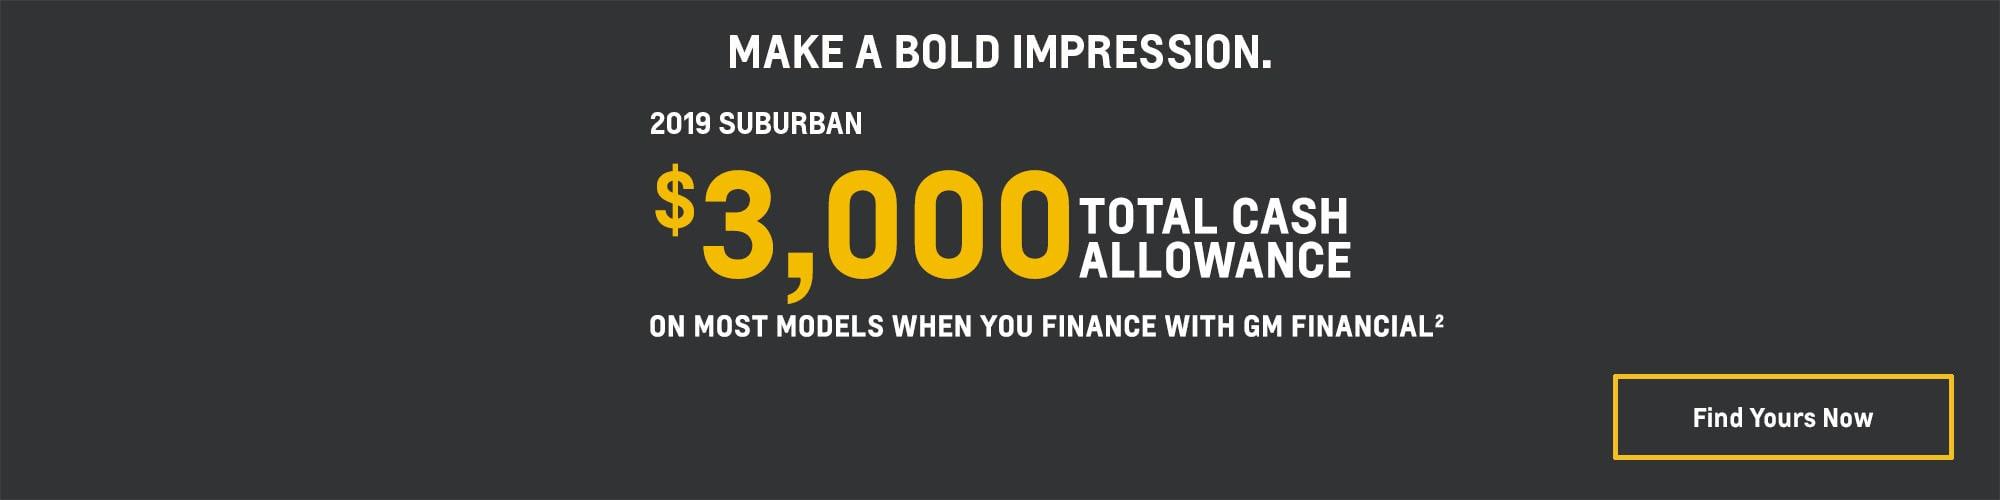 2019 Chevrolet Suburban: $3,000 Total Cash Allowance